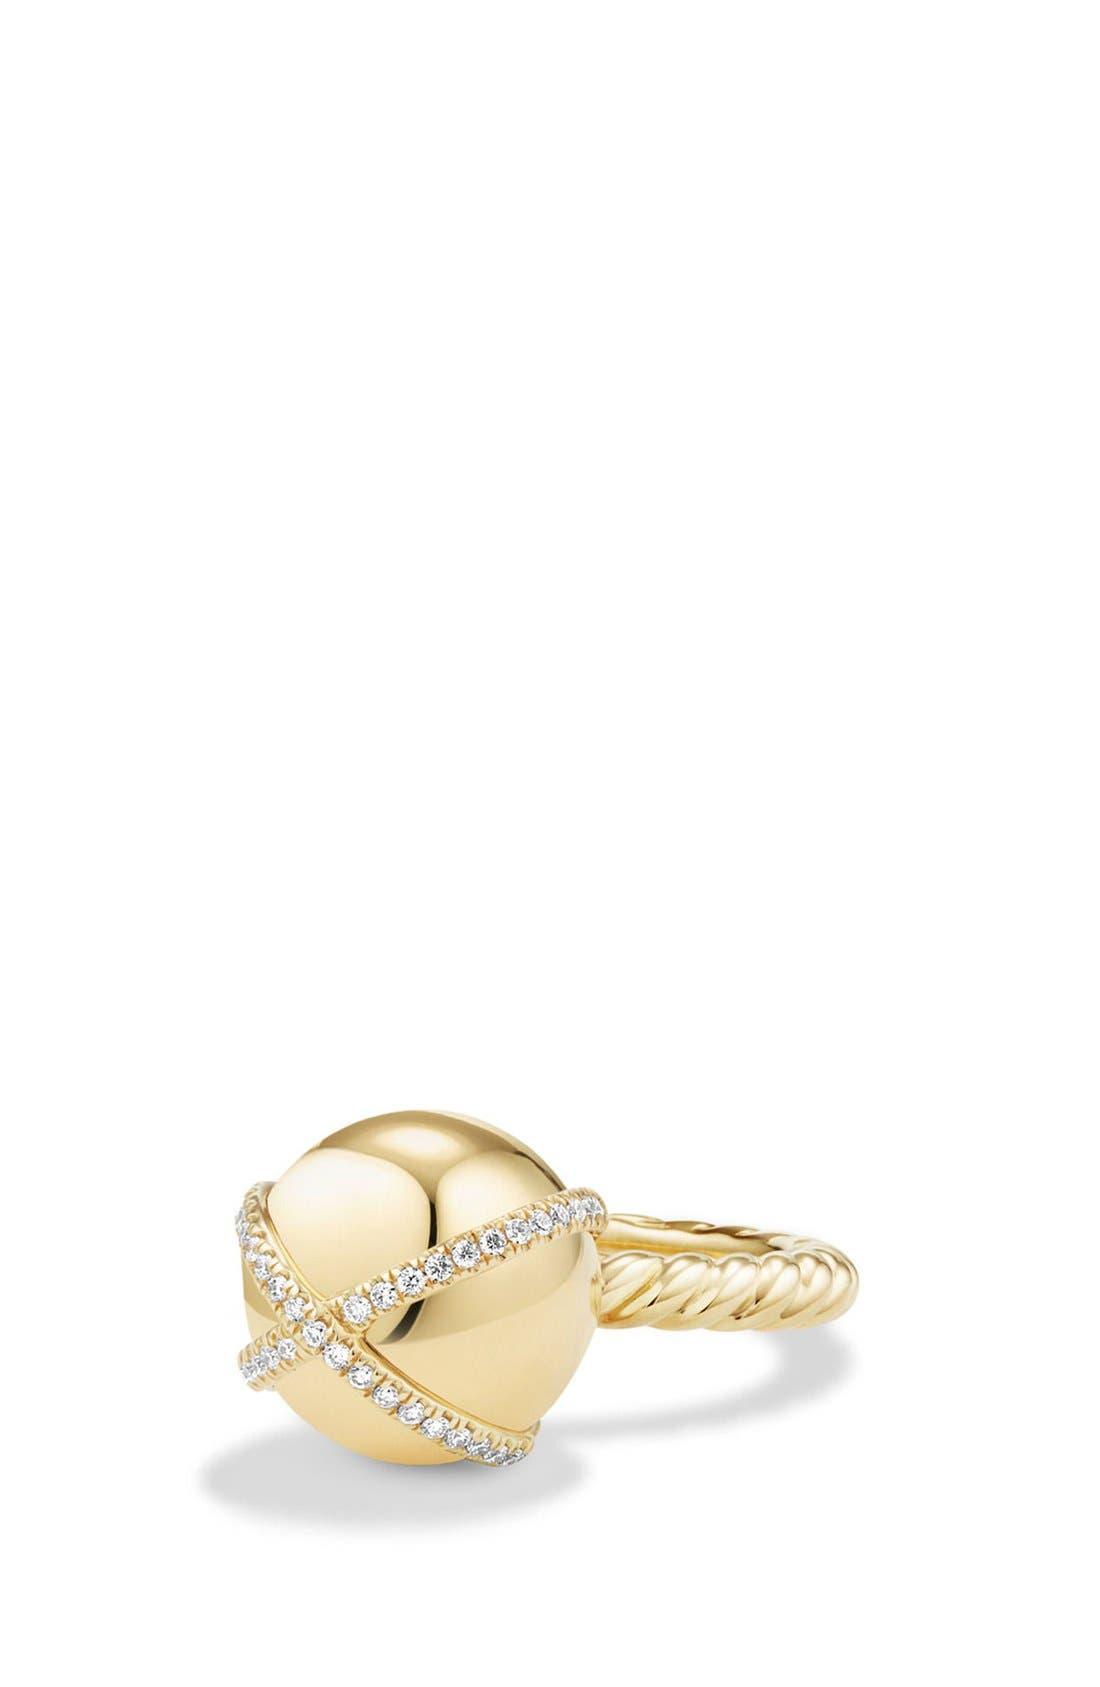 David Yurman 'Solari' Wrap Ring with Pavé Diamonds in 18k Gold